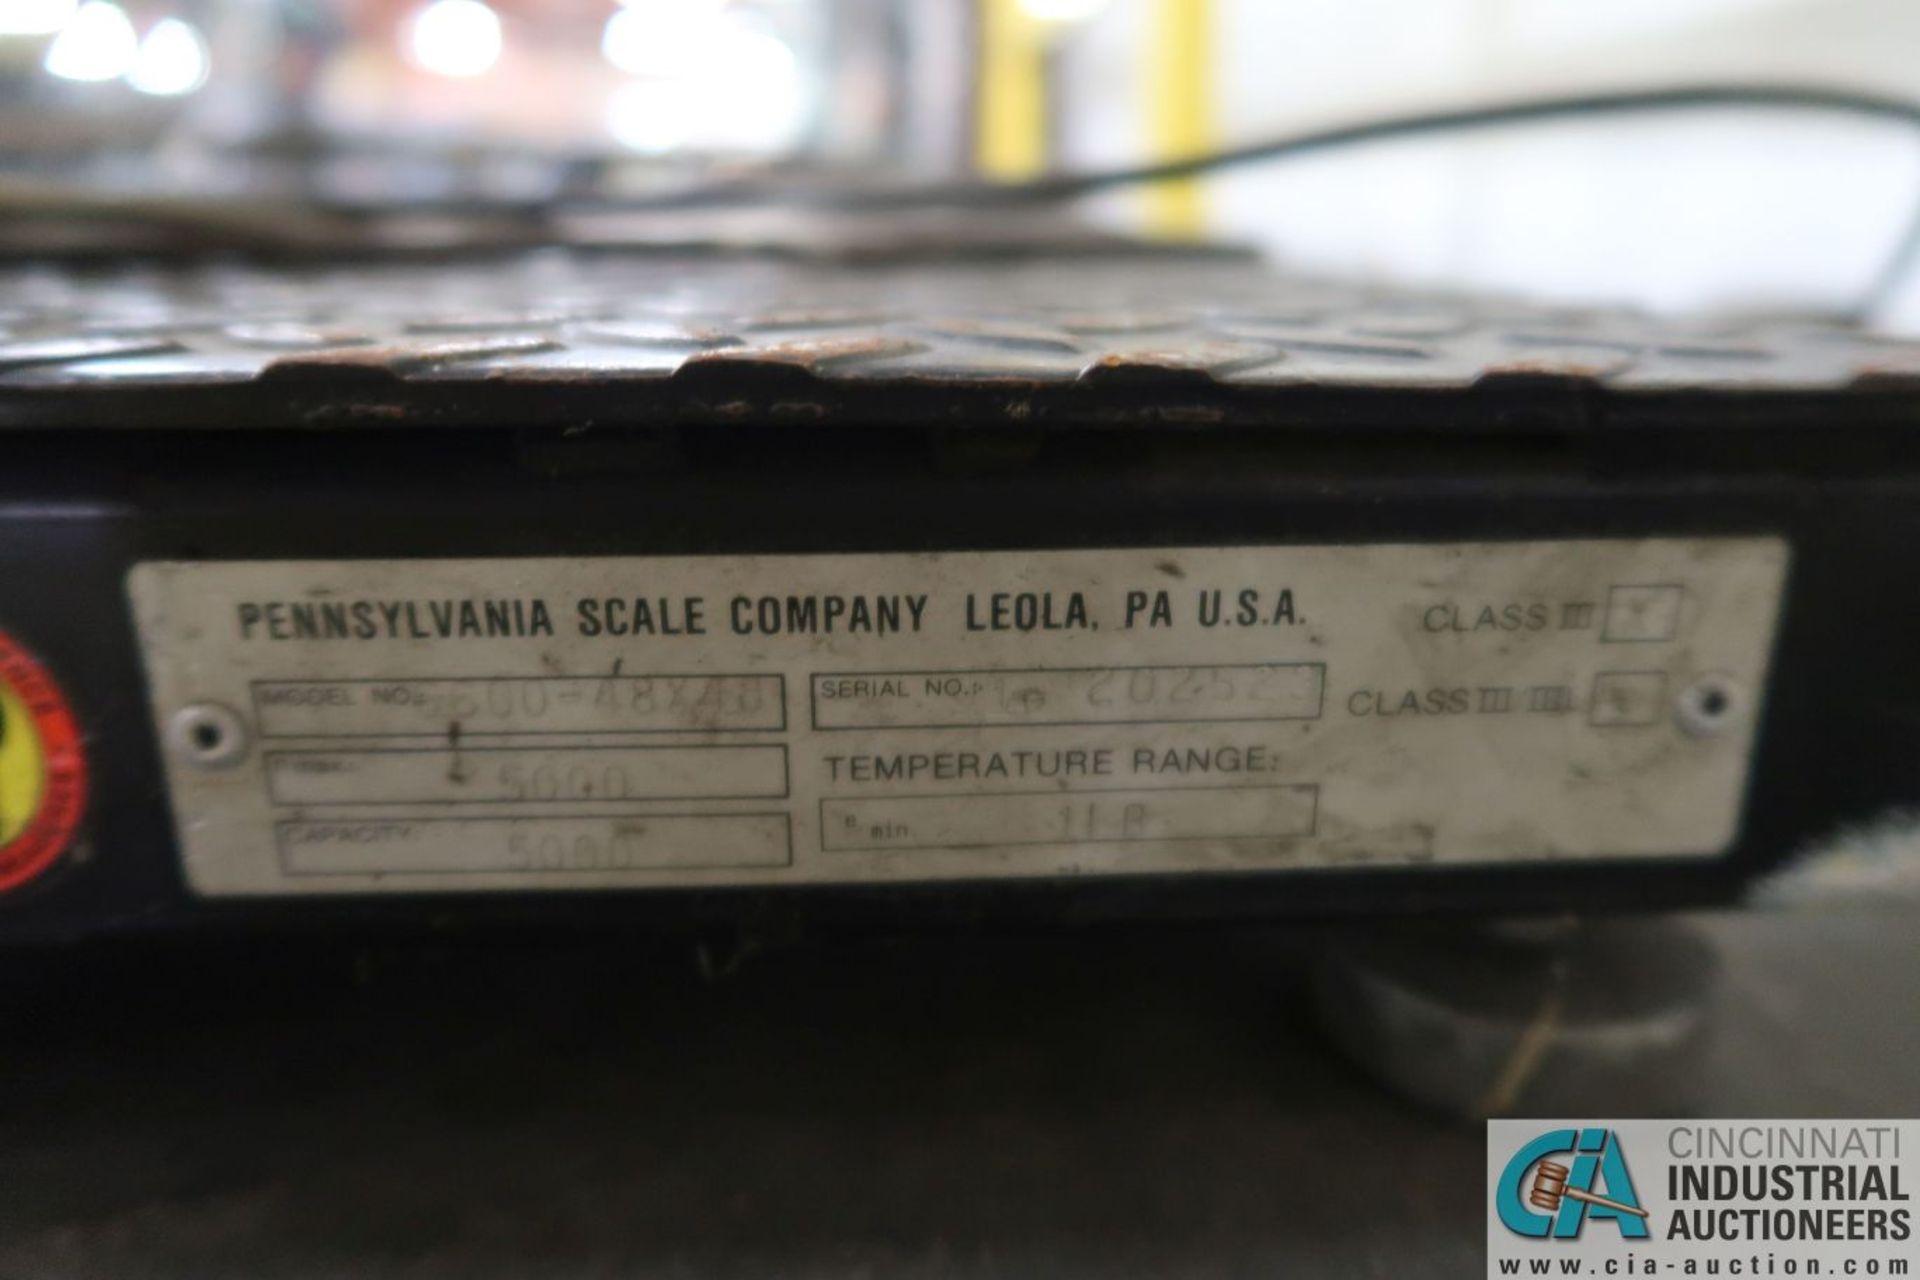 "5,000 LB. CAPACITY PENNSYLVANIA MDOEL 6600 48"" X 48"" PLATFORM SCALE WITH PENNSYLVANIA MODEL 5600 - Image 3 of 3"